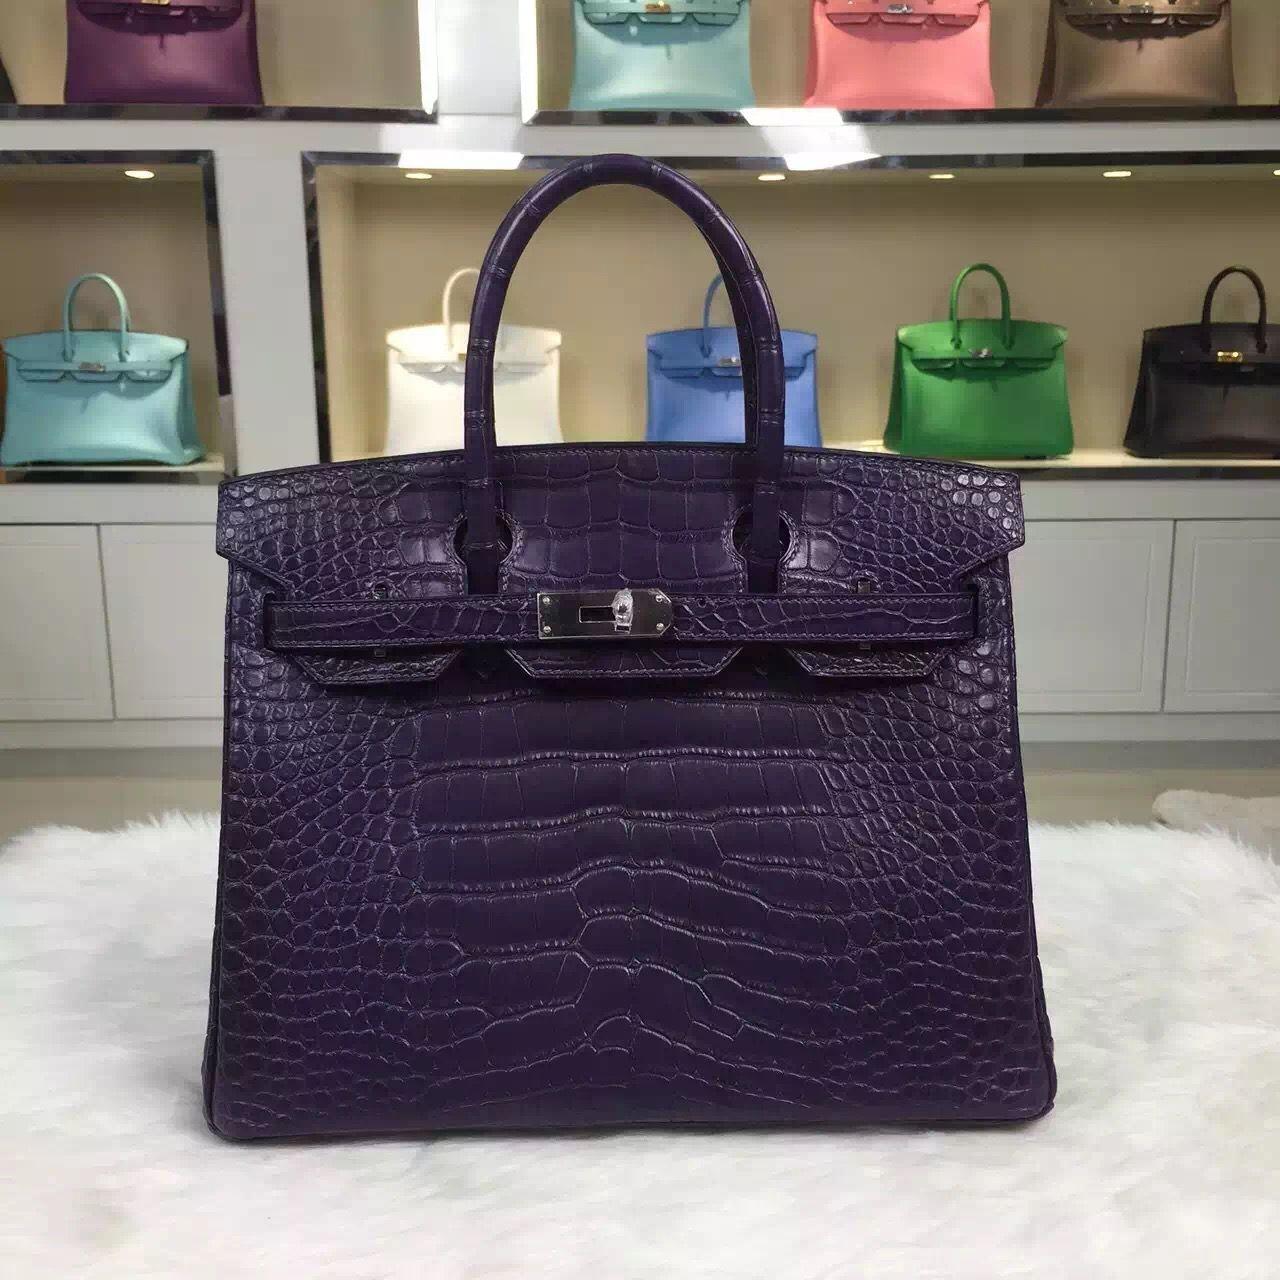 8a0a5f03ef Brand  Hermes  Style  Birkin Bag30cm  Material Crocodile matt Leather (HCP  original leather) Color Black Currant Purple   Hardware  silver